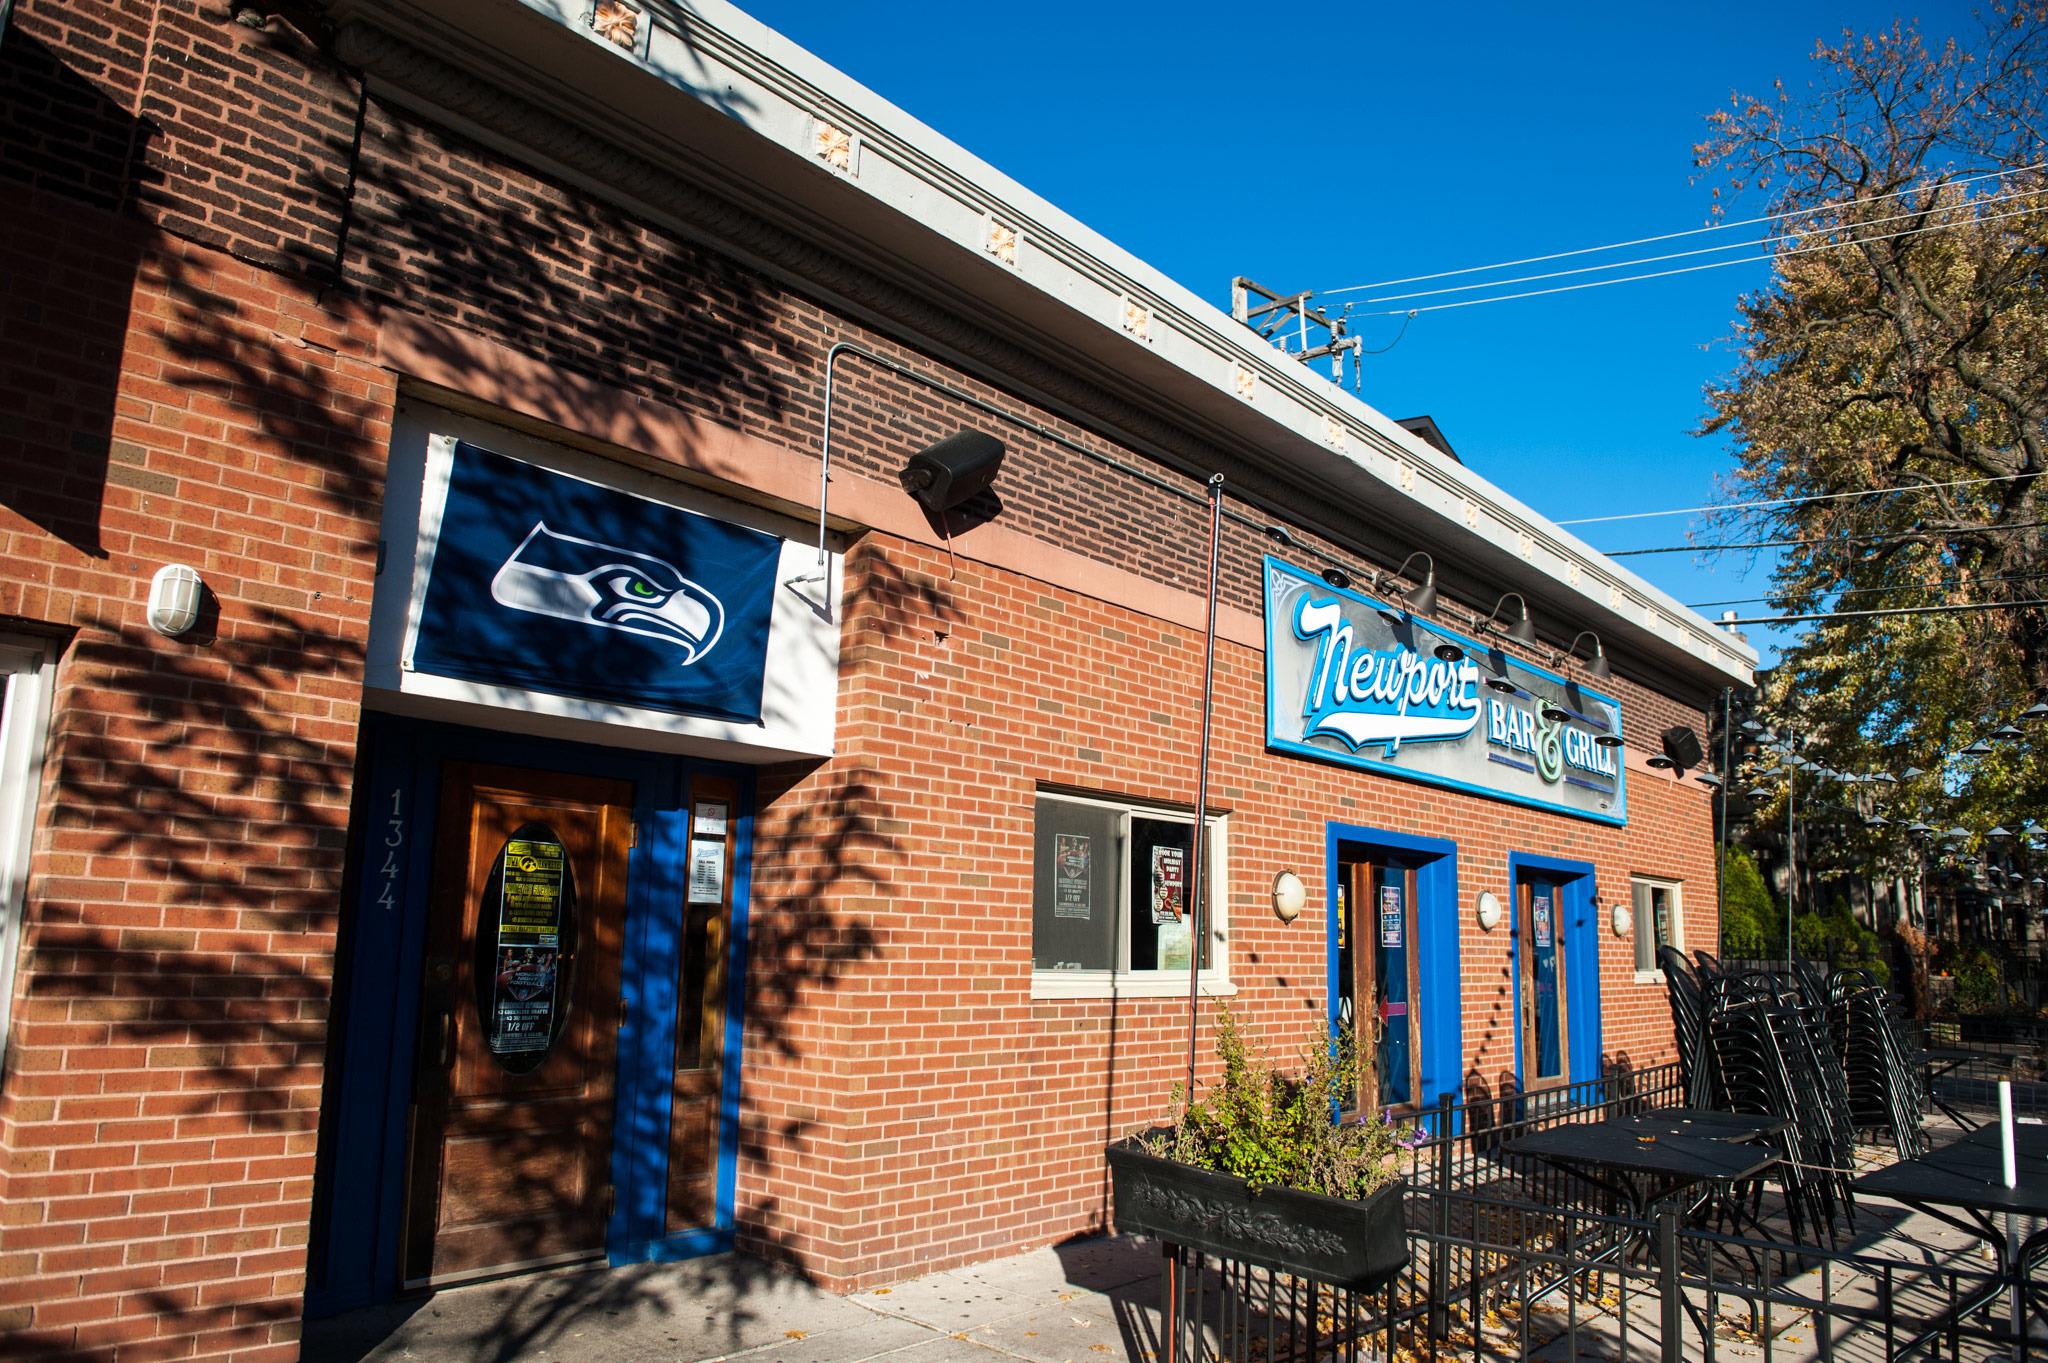 Newport Bar and Grill